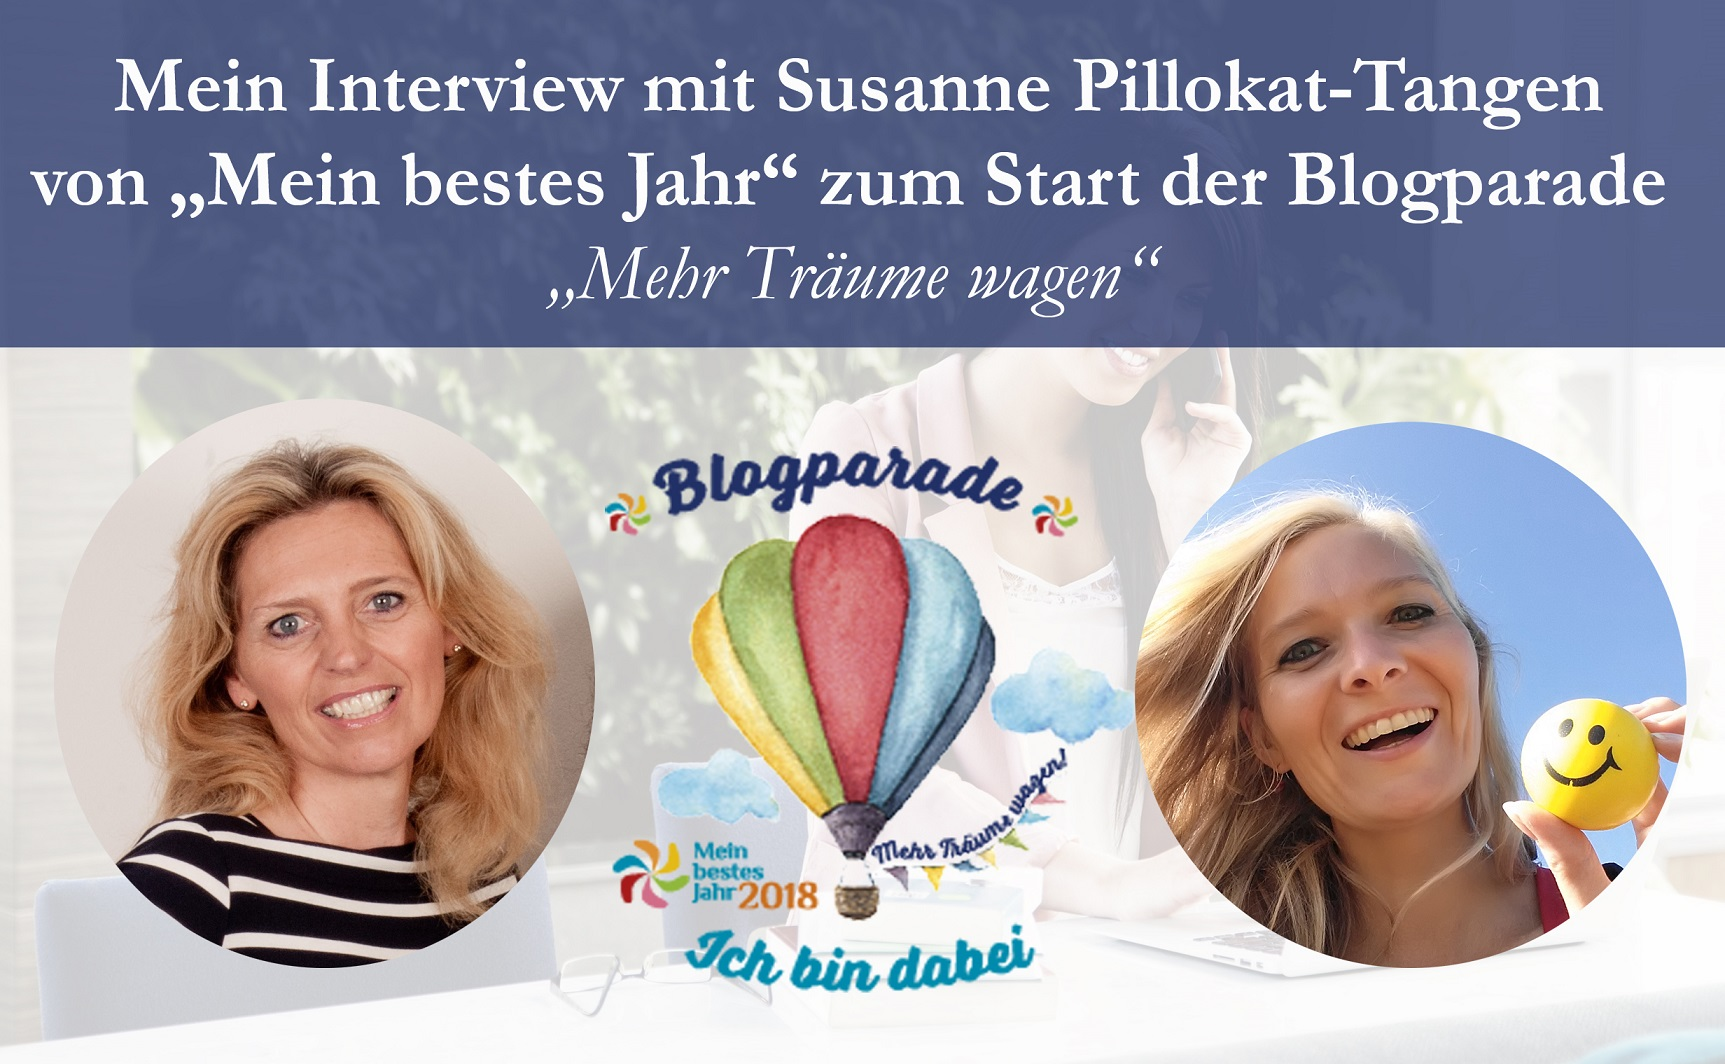 Susanne Pillokat-Tangen, Christin Prizelius